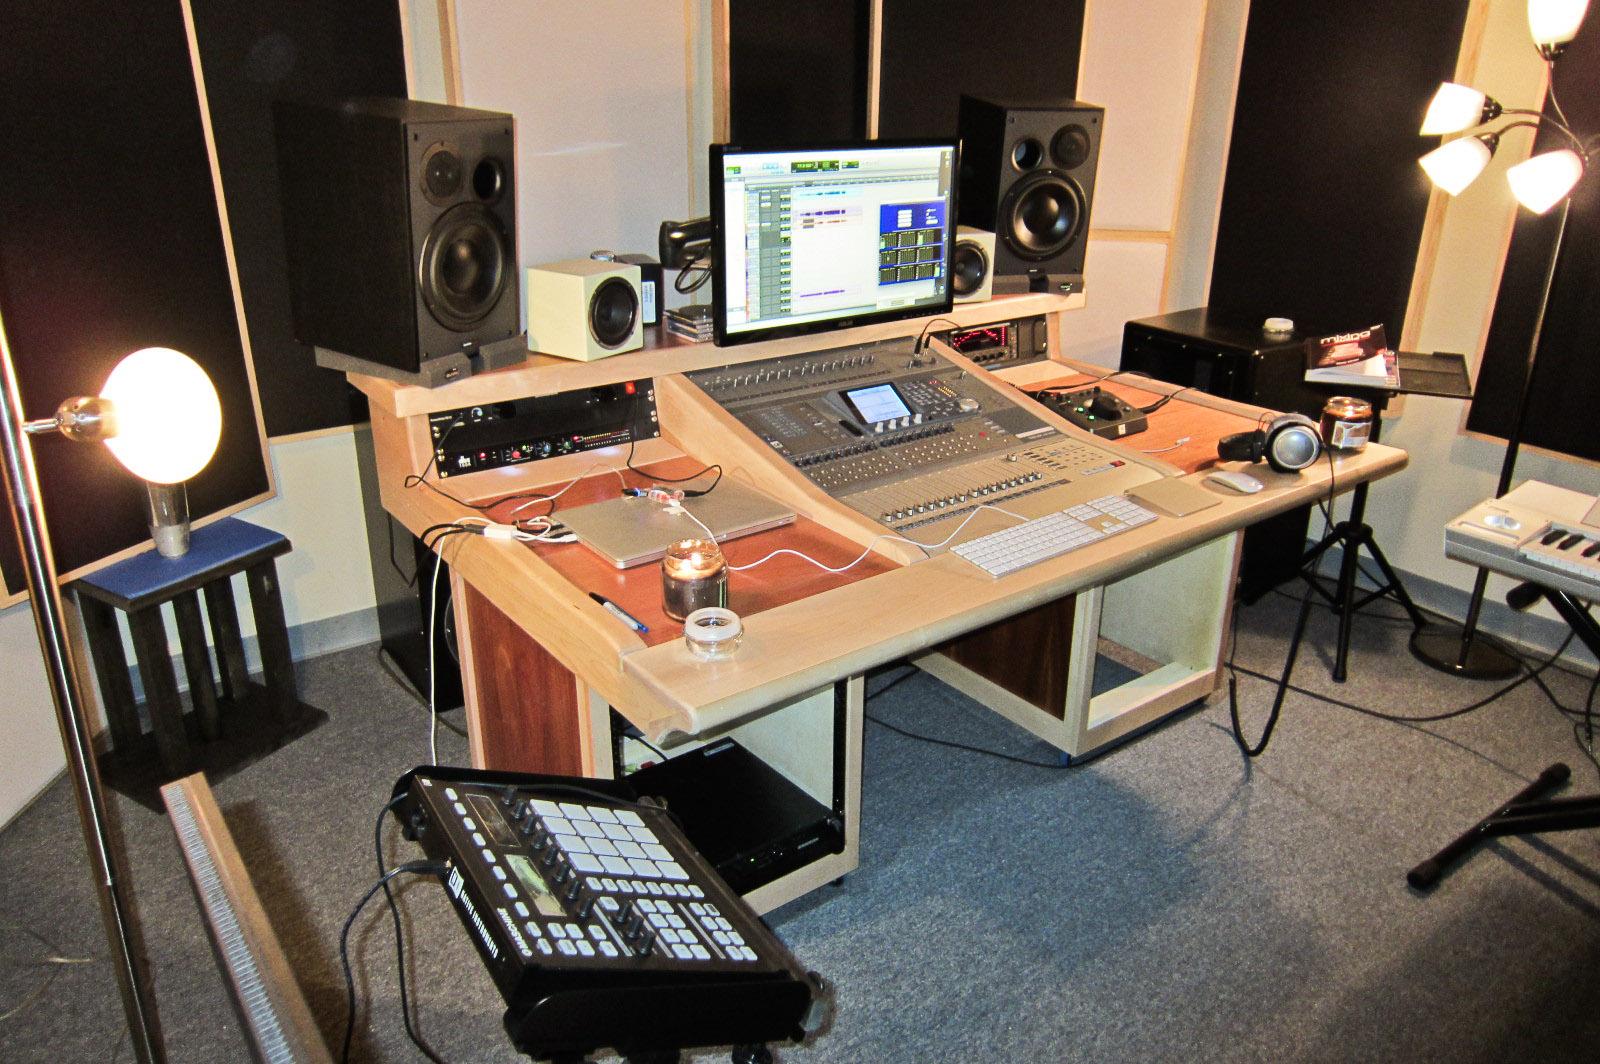 mixer desk for tascam dm 3200 self made gearslutz pro audio community. Black Bedroom Furniture Sets. Home Design Ideas